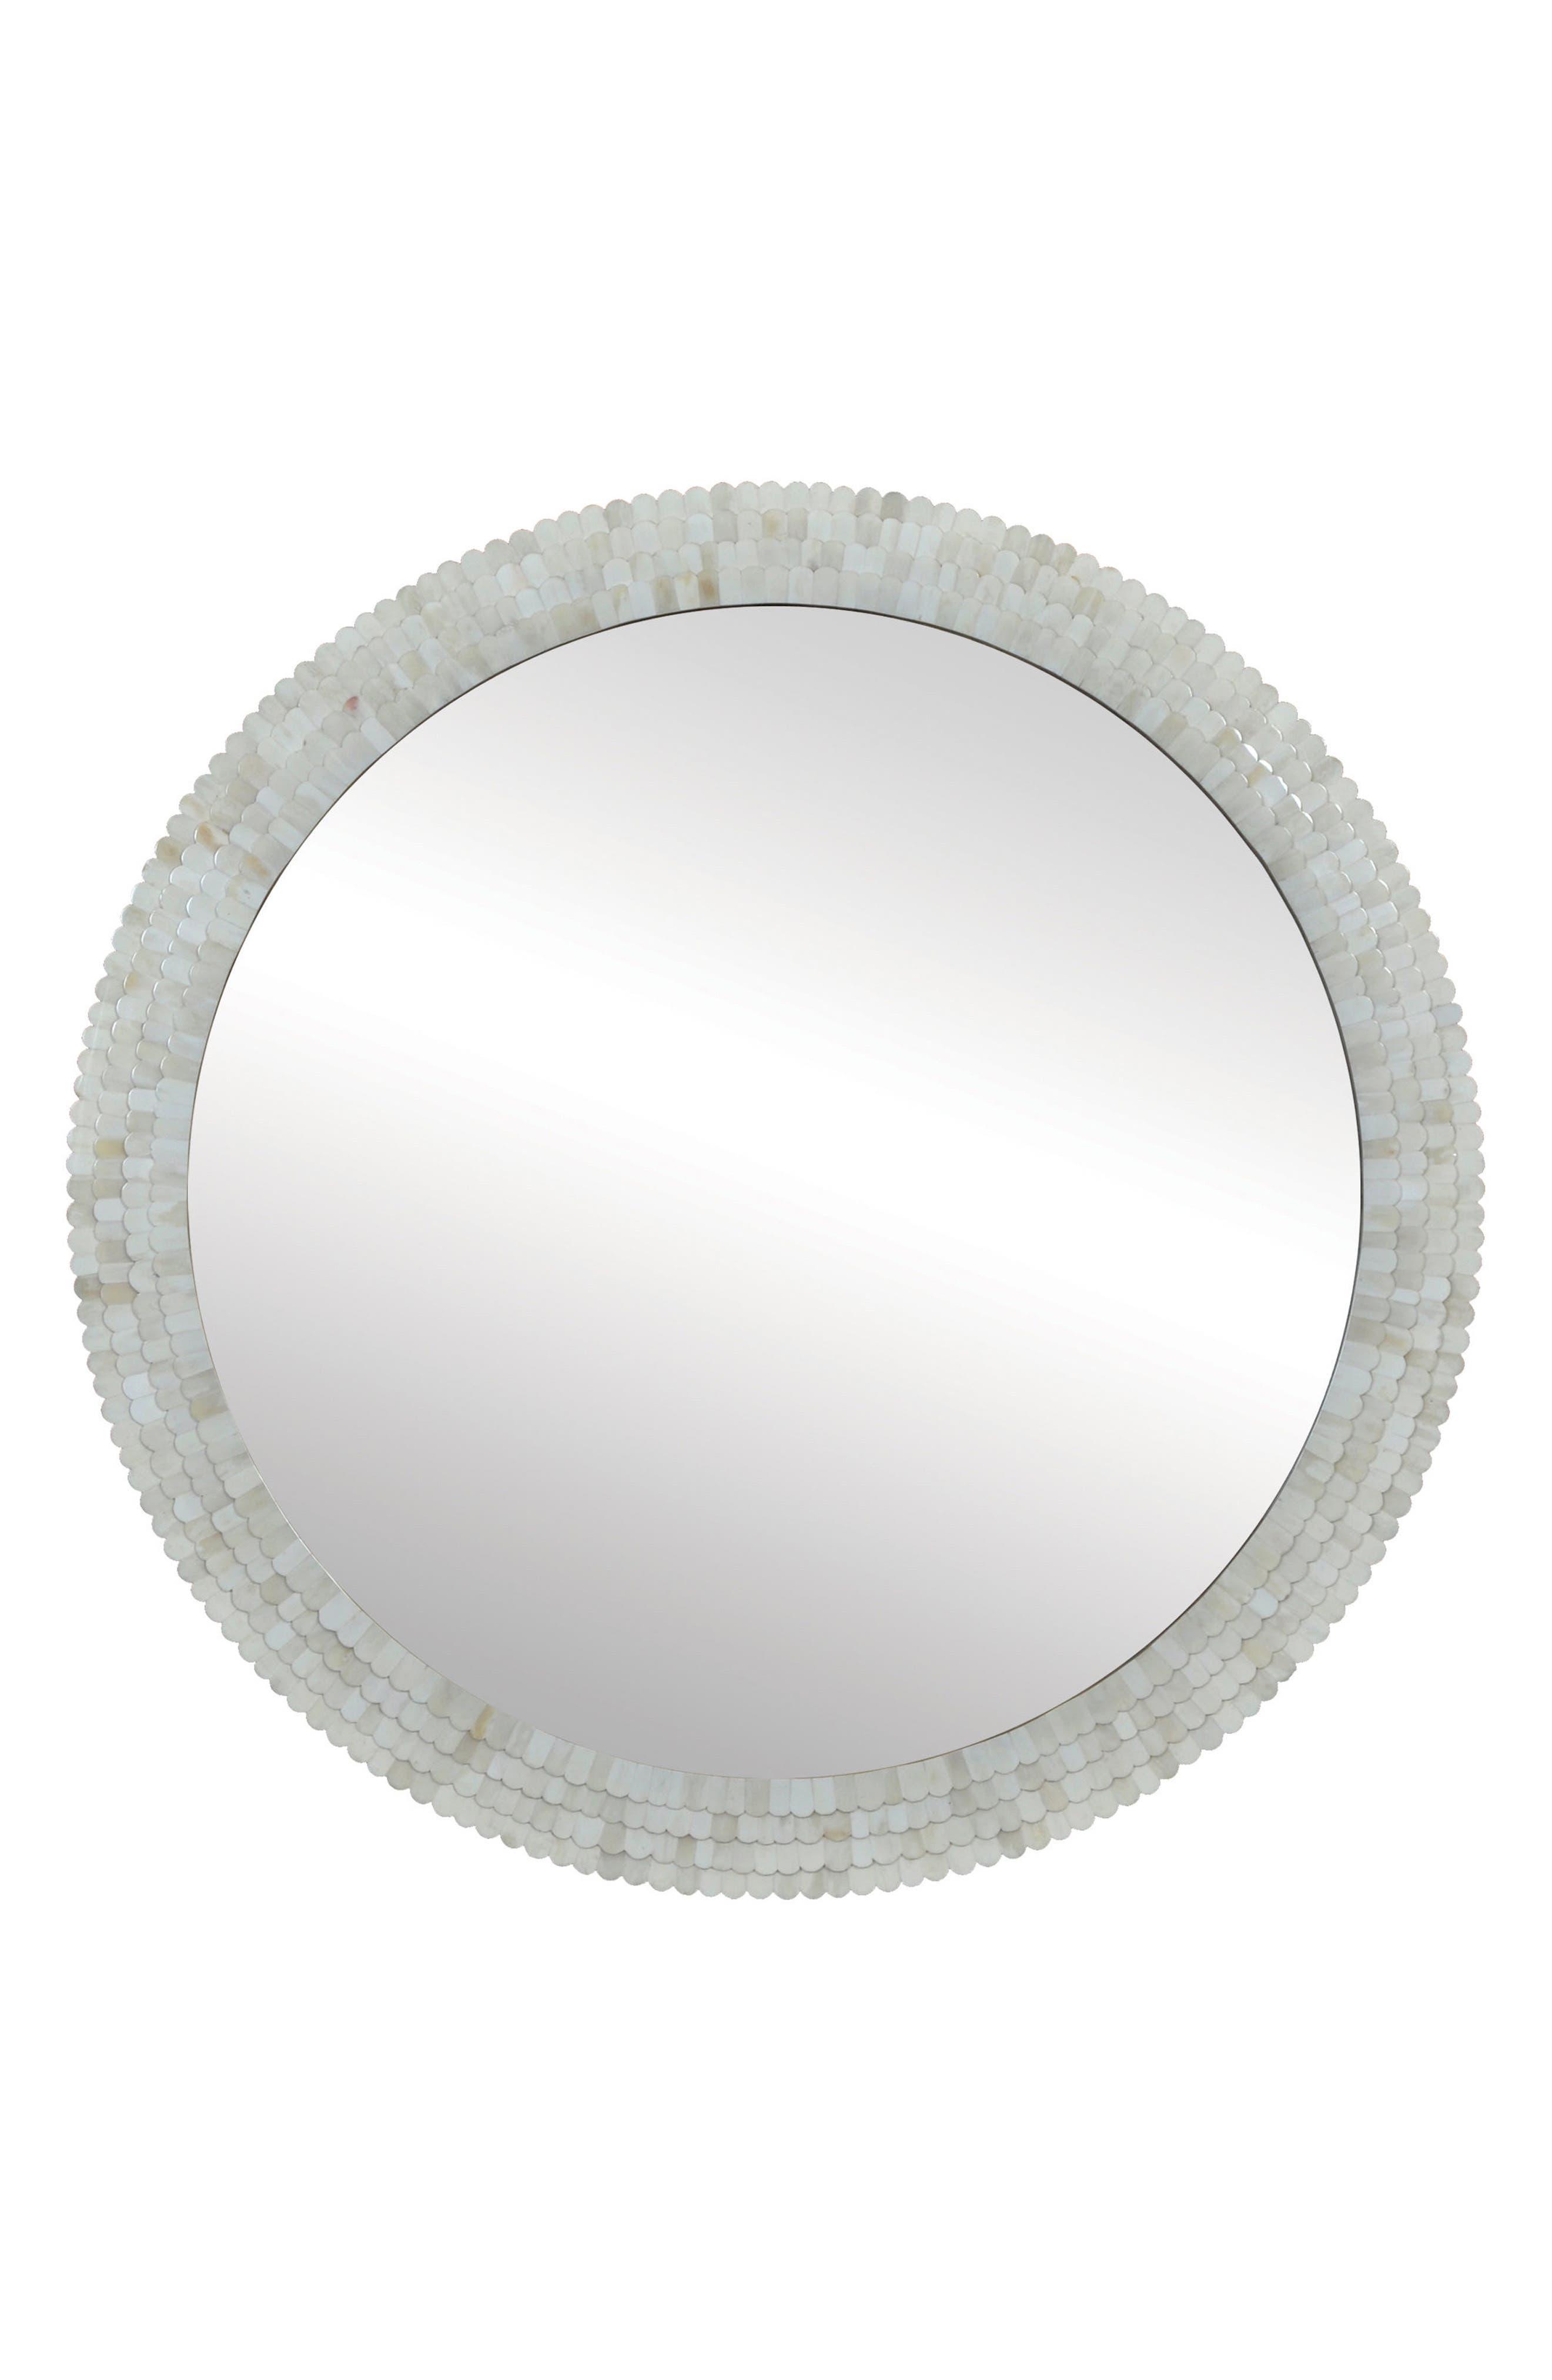 Main Image - Renwil Round Mirror